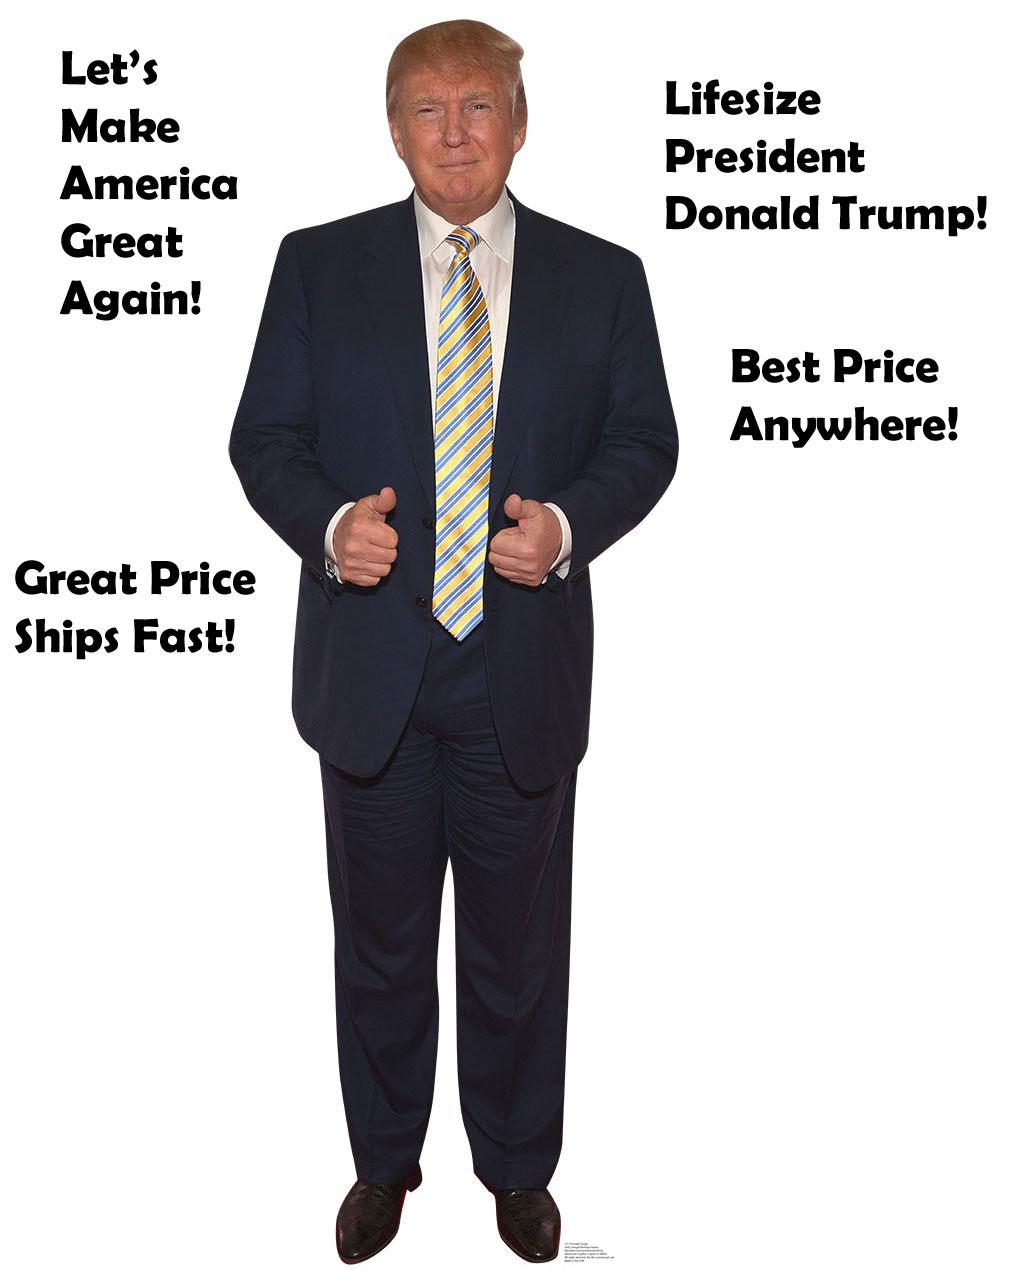 Trump Cardboard Cutouts Donald Trump Cardboard Cutouts Life size cheap! Sale!